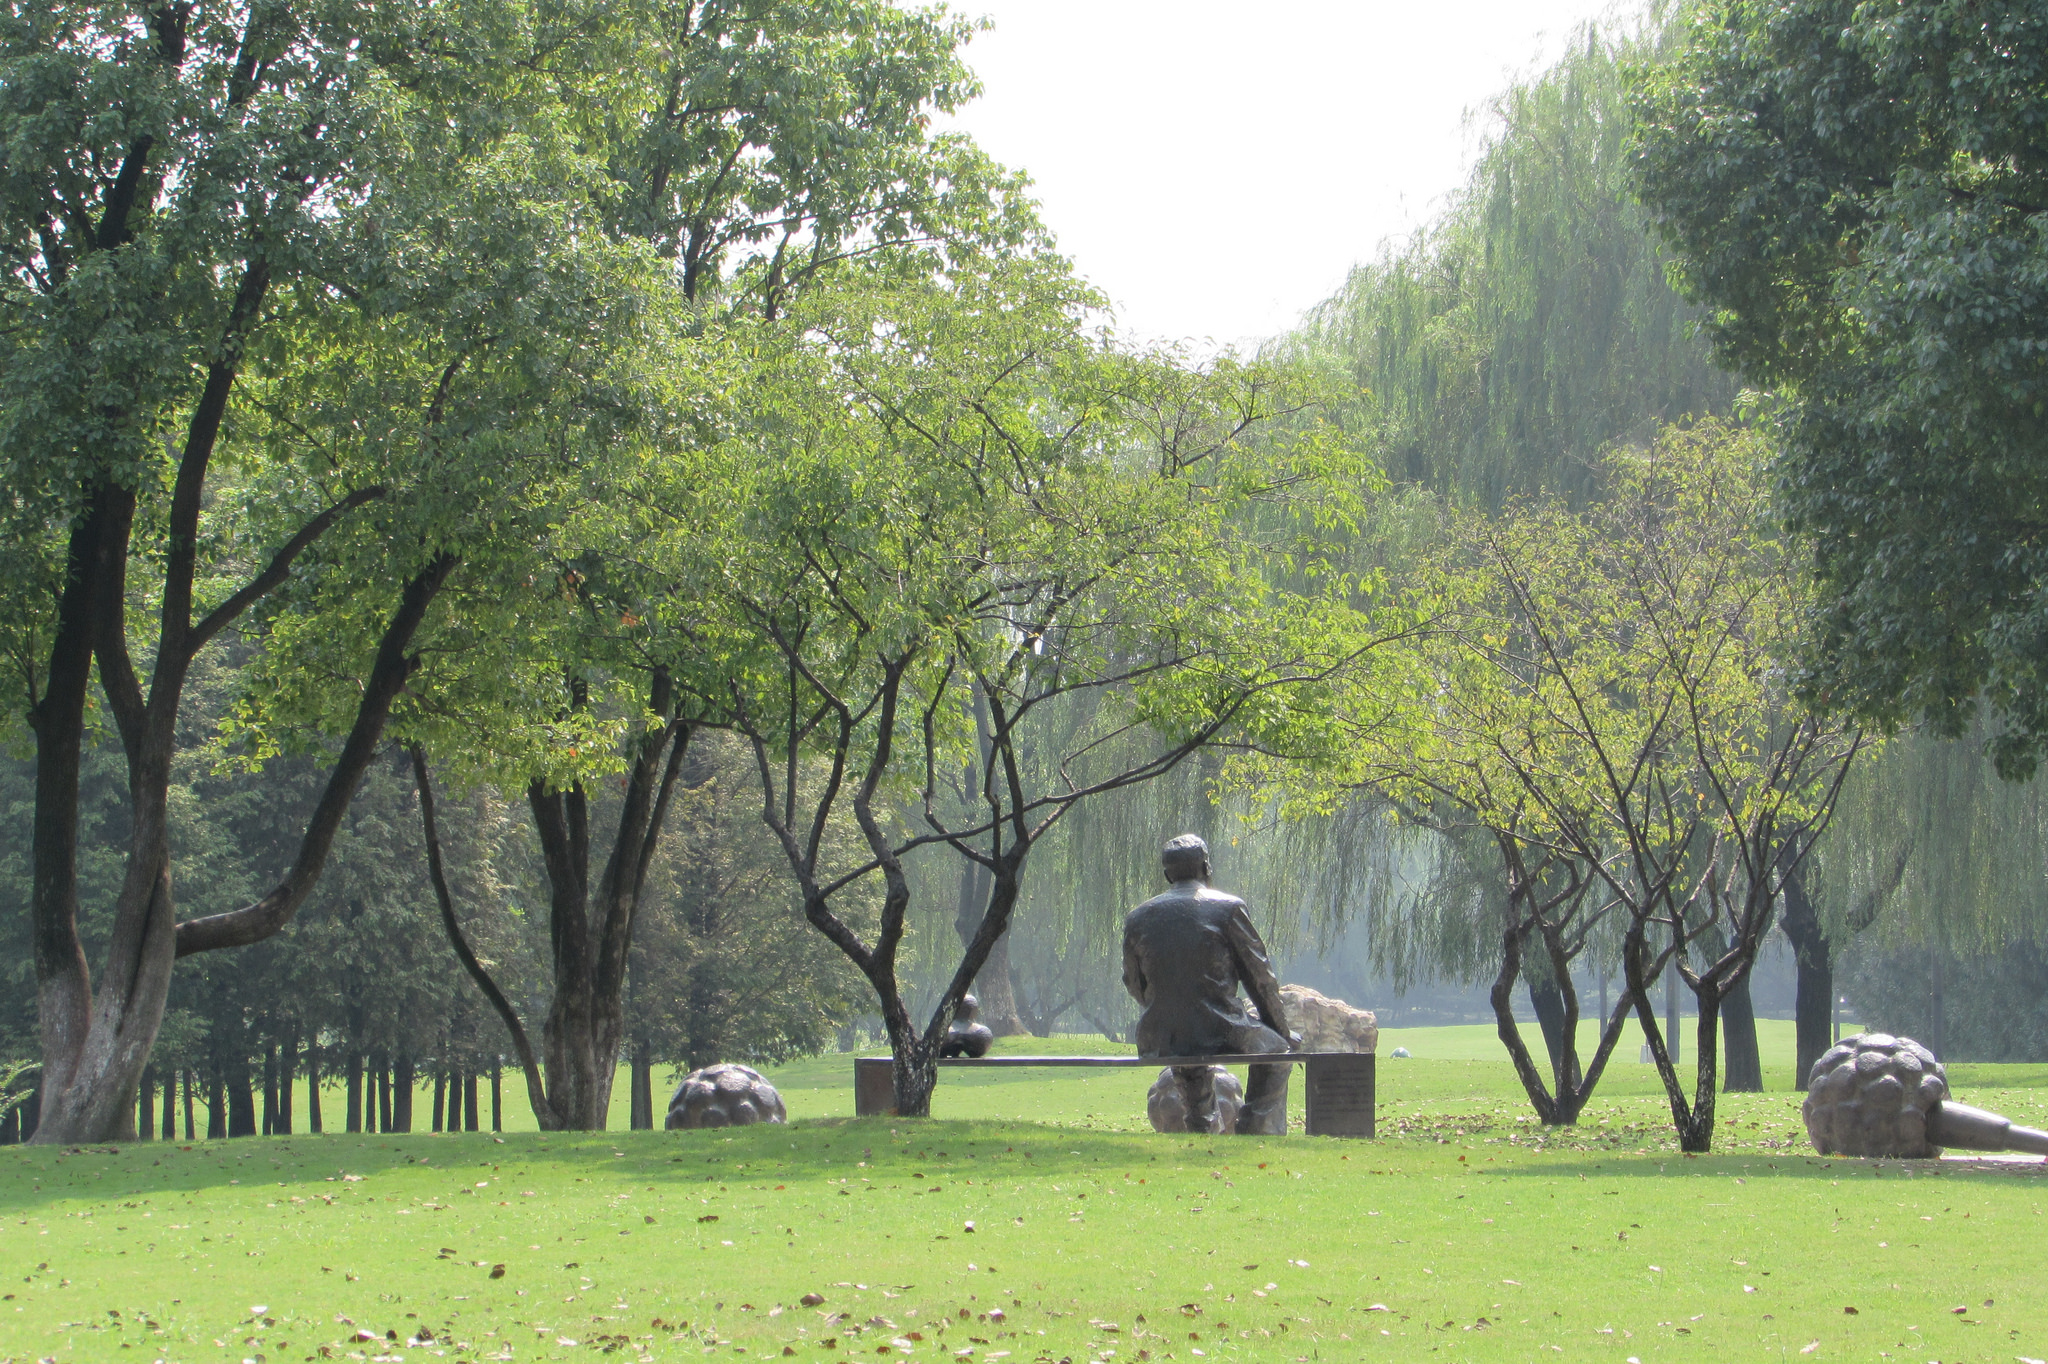 Чжэцзянский университет, скульптура в парке